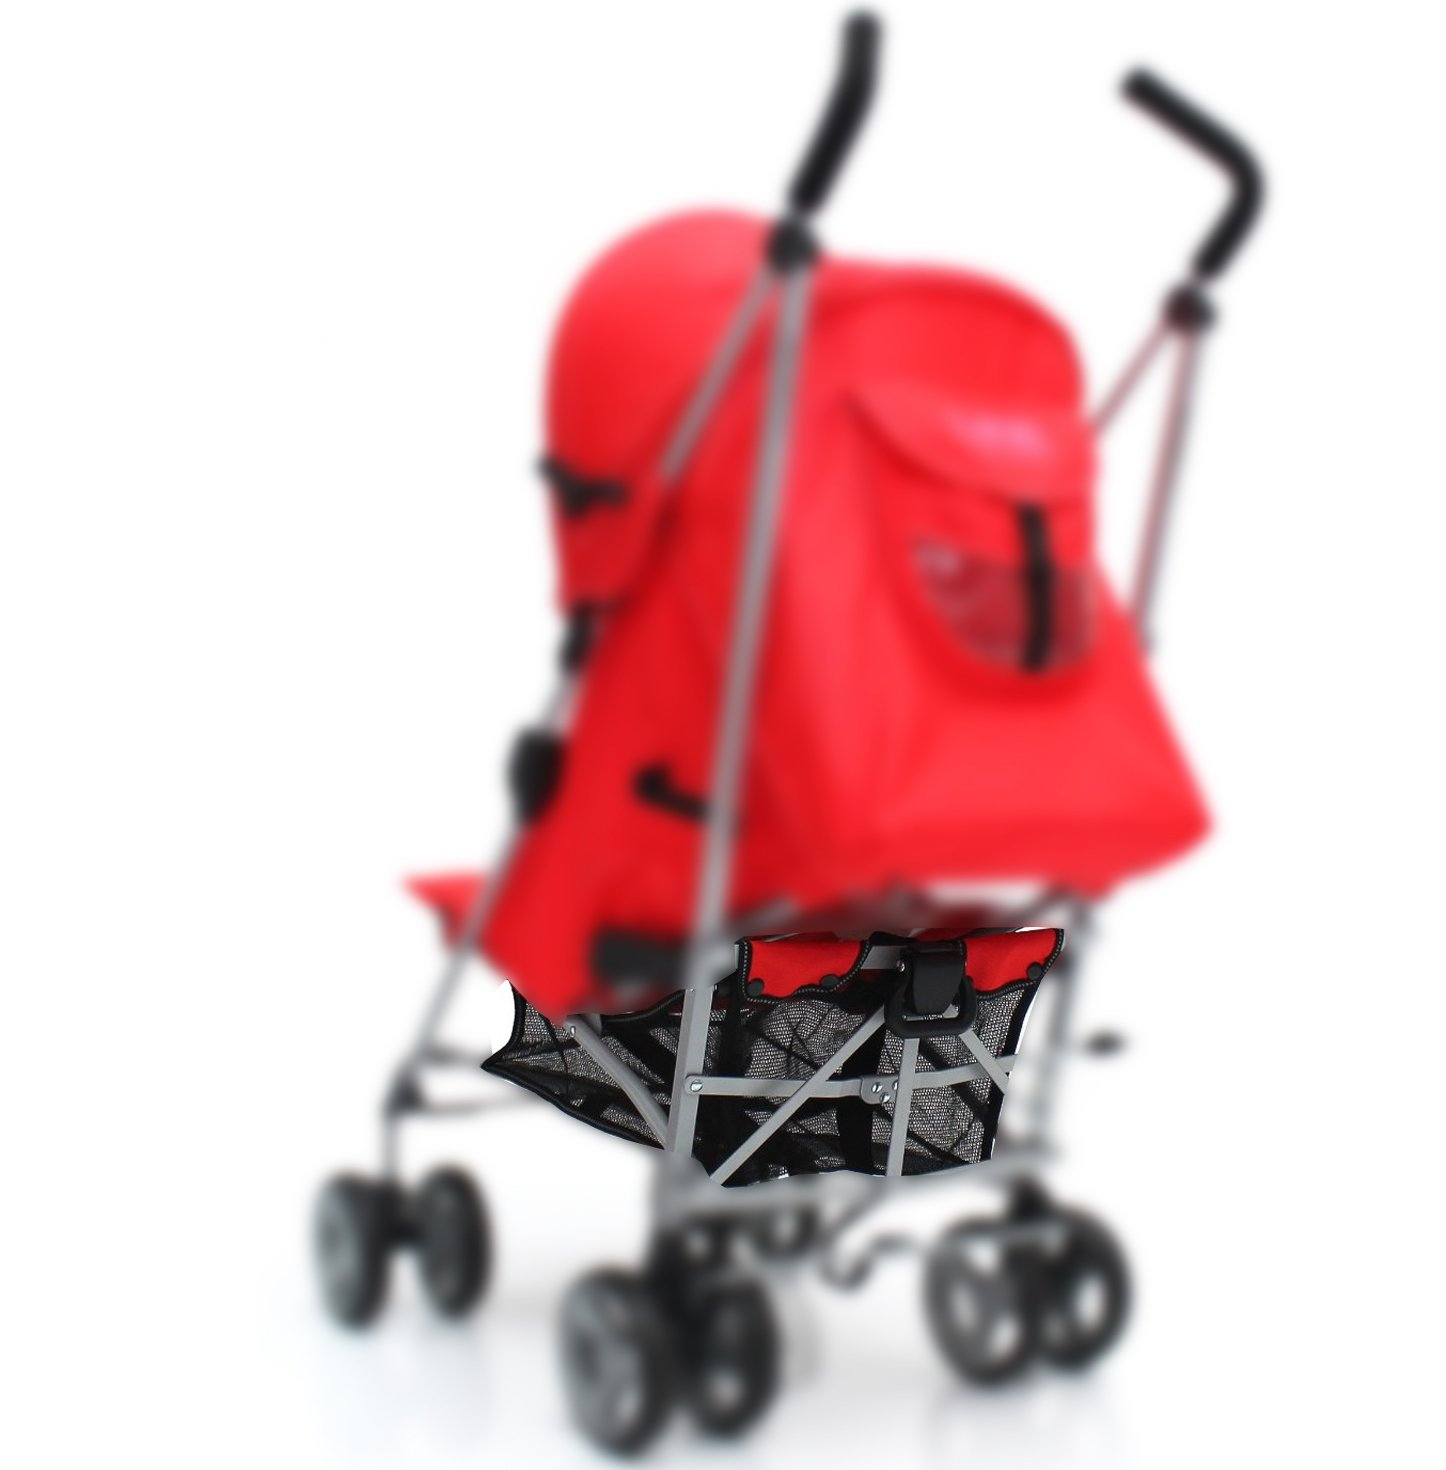 (Spare Parts Shopping Basket) Zeta Vooom - RED UNIVERSAL! ZeTA®